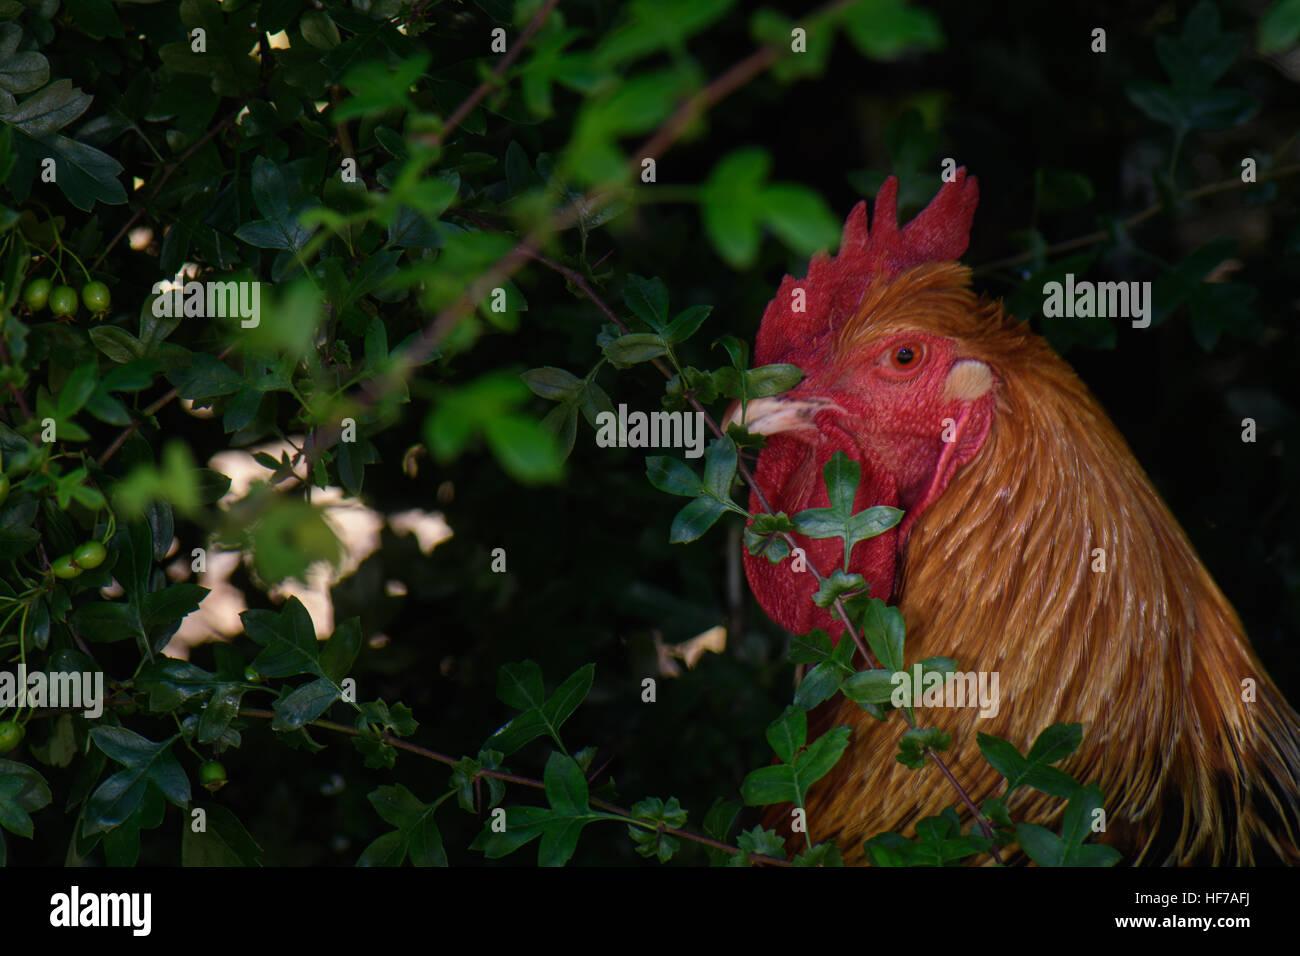 Buff Sussex Hahn erkundet den Garten, Stockbild